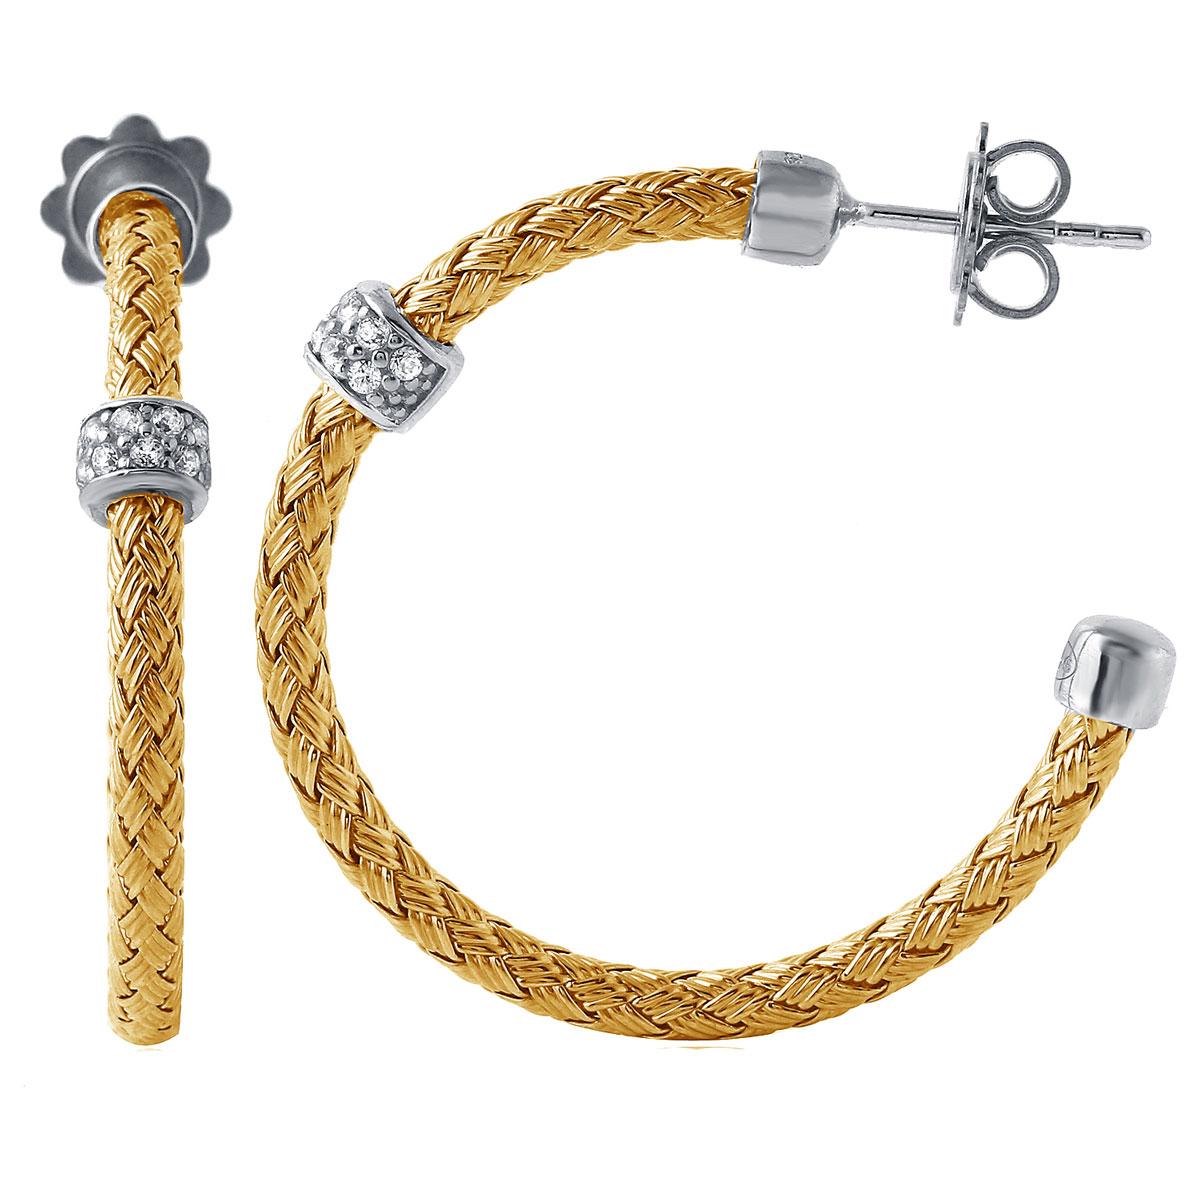 Charles-Garnier-Novara-Earrings-31.jpg